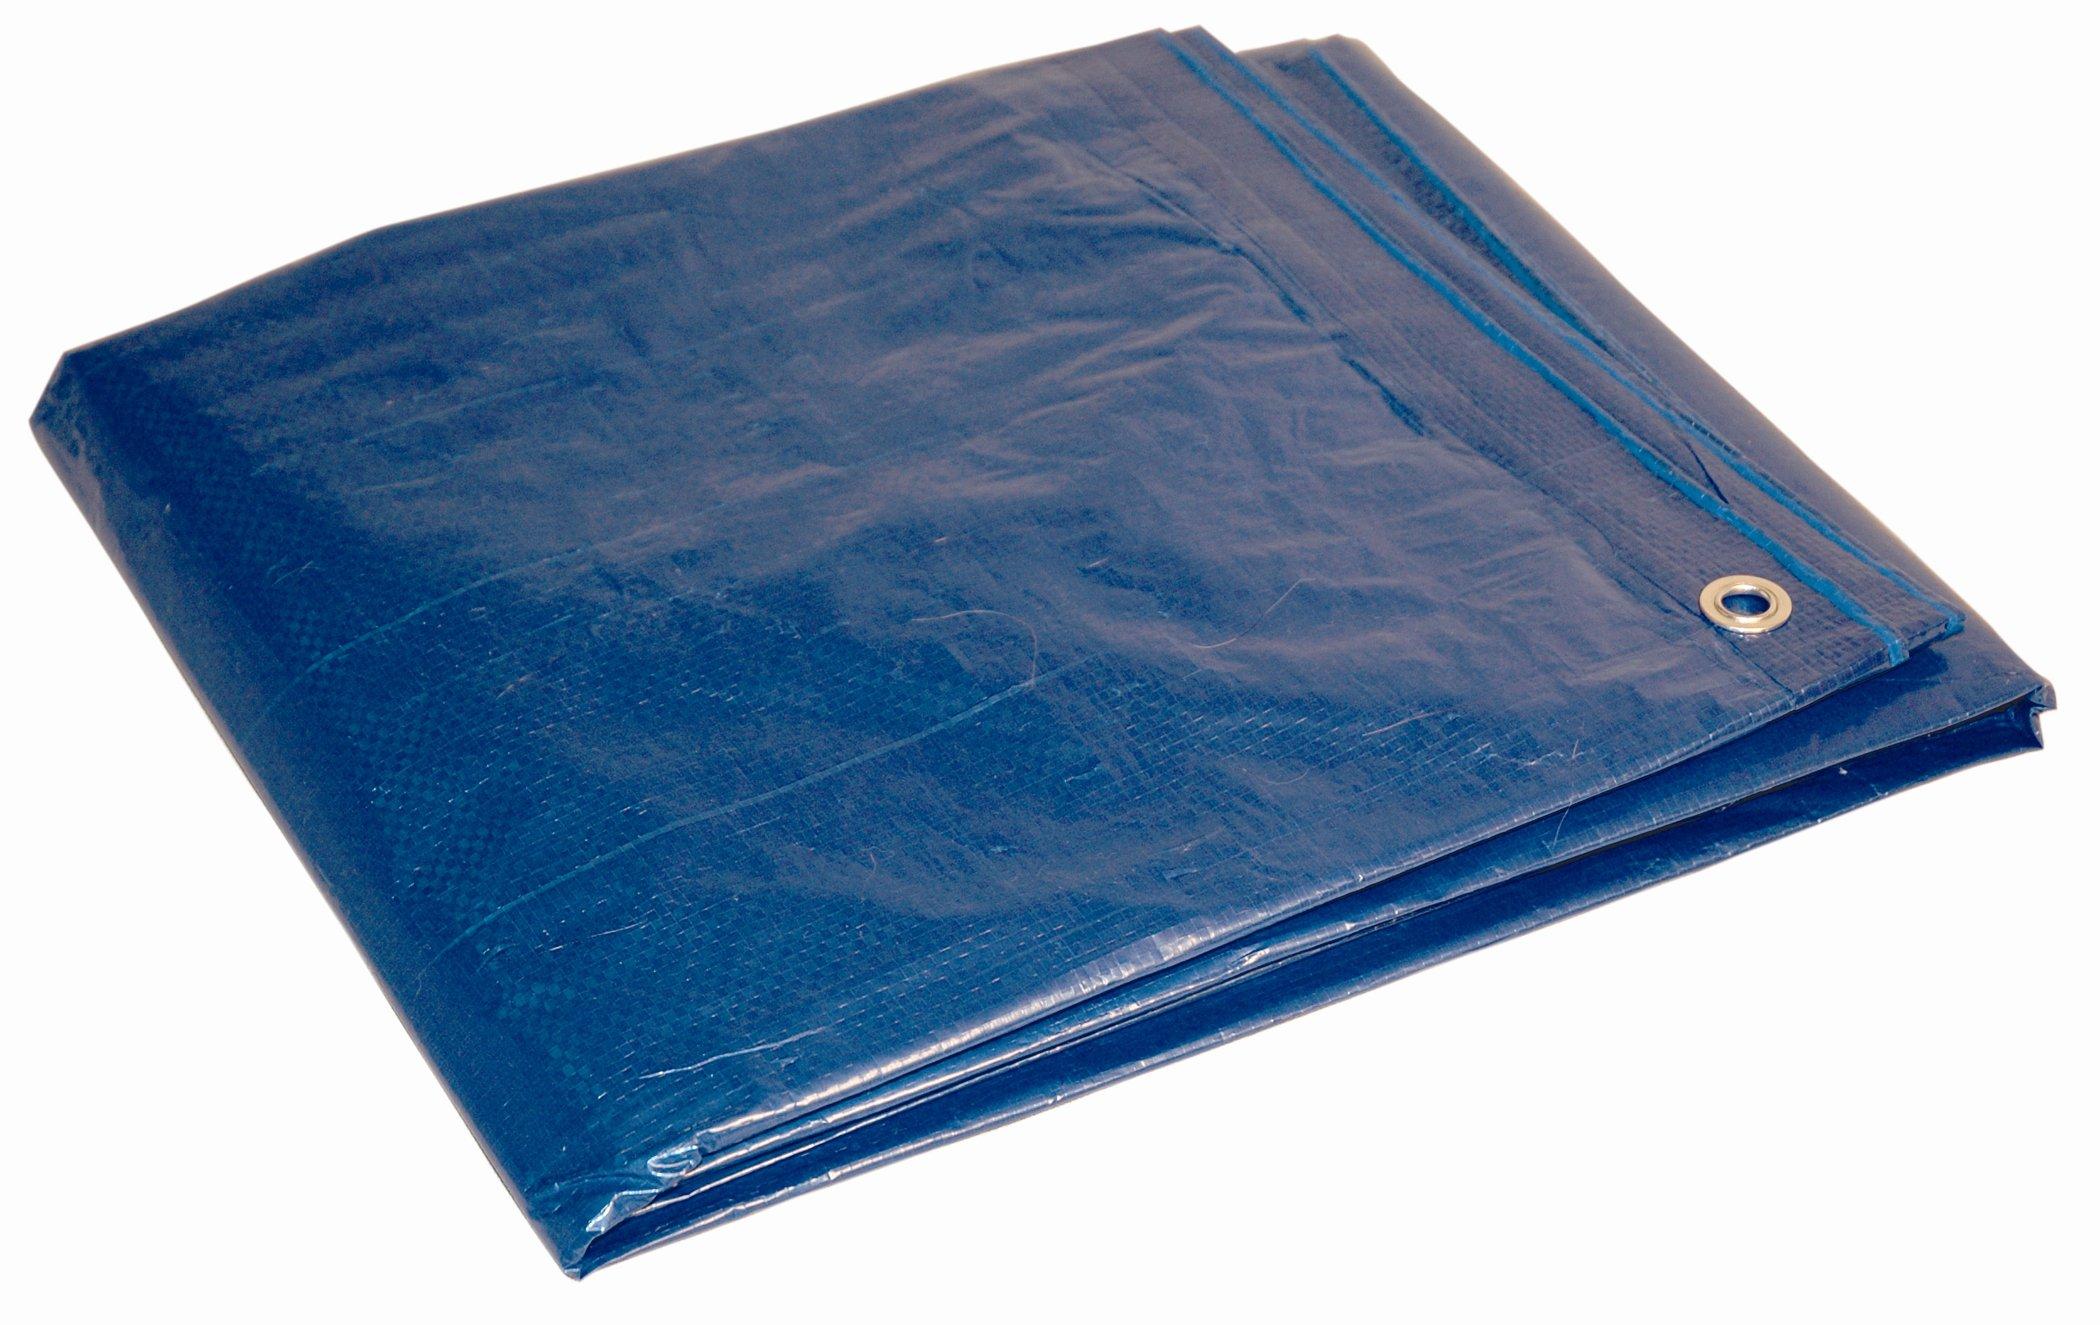 20' x 30' Dry Top Blue Full Size 7-mil Poly Tarp item #020304